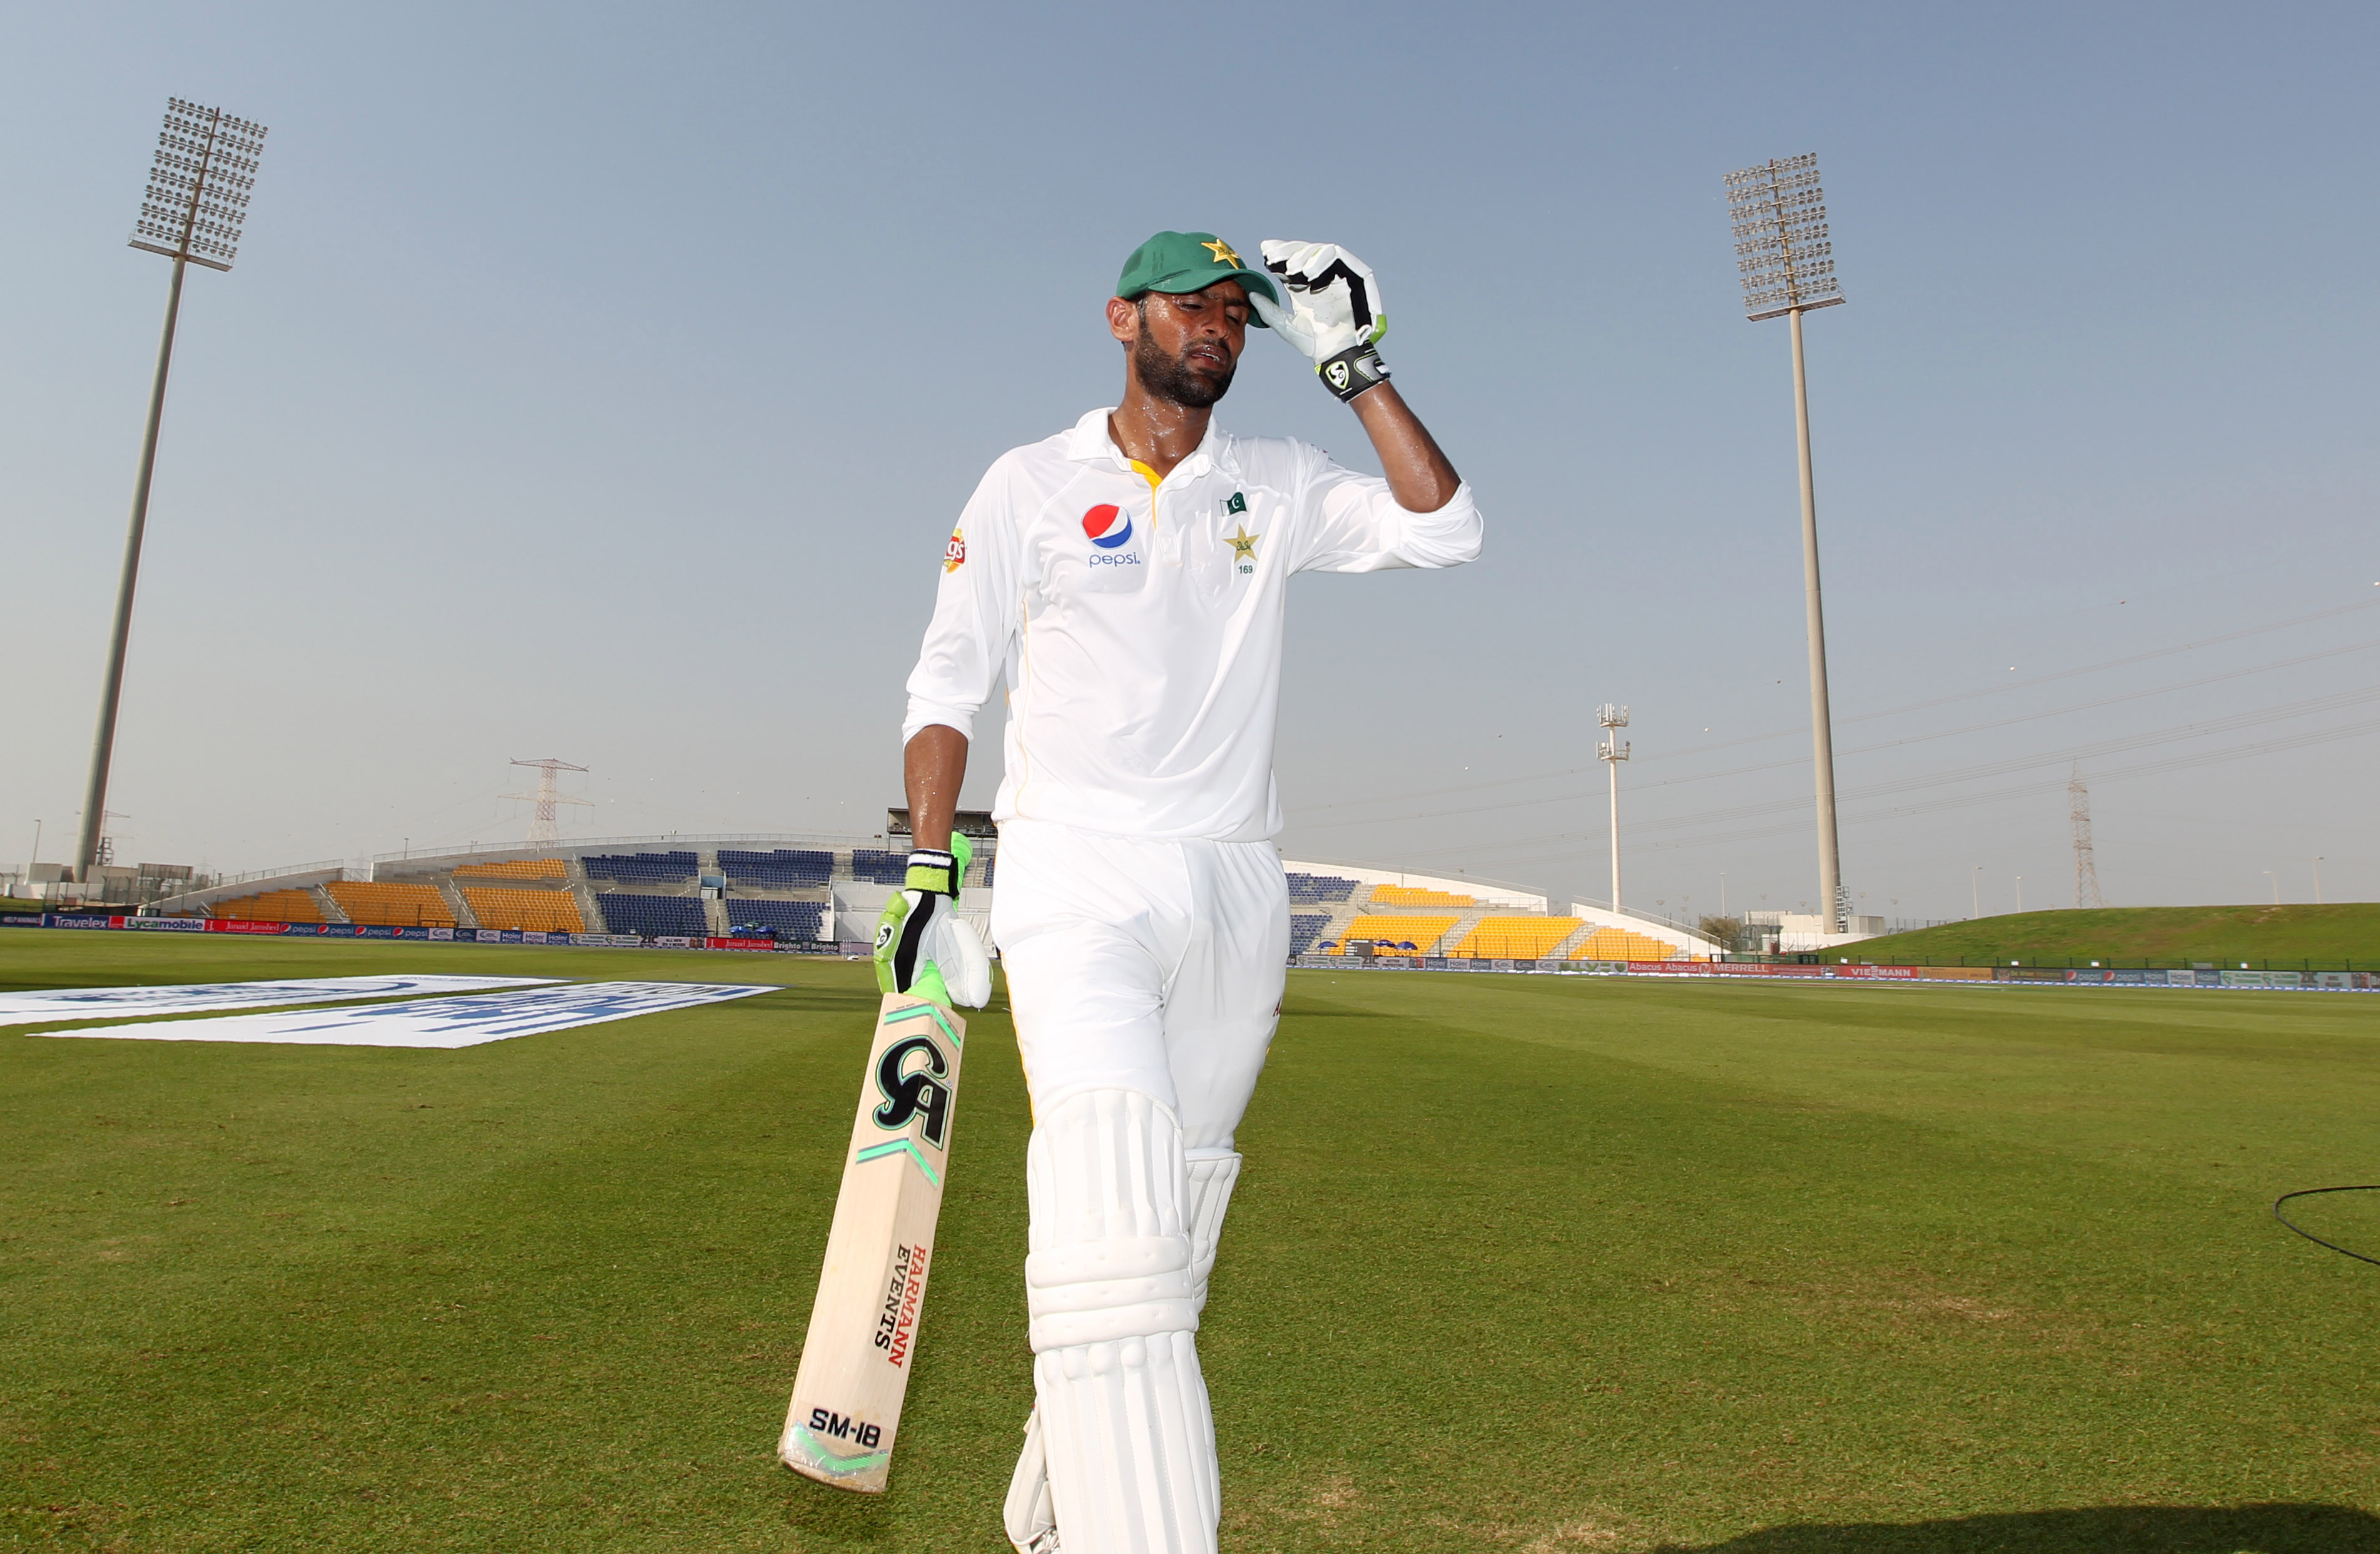 Cricket - Pakistan v England - First Test - Zayed Cricket Stadium, Abu Dhabi, United Arab Emirates - 14/10/15nPakistan's Shoaib Malik walks off unbeaten at teanAction Images via Reuters / Jason O'BriennLivepic